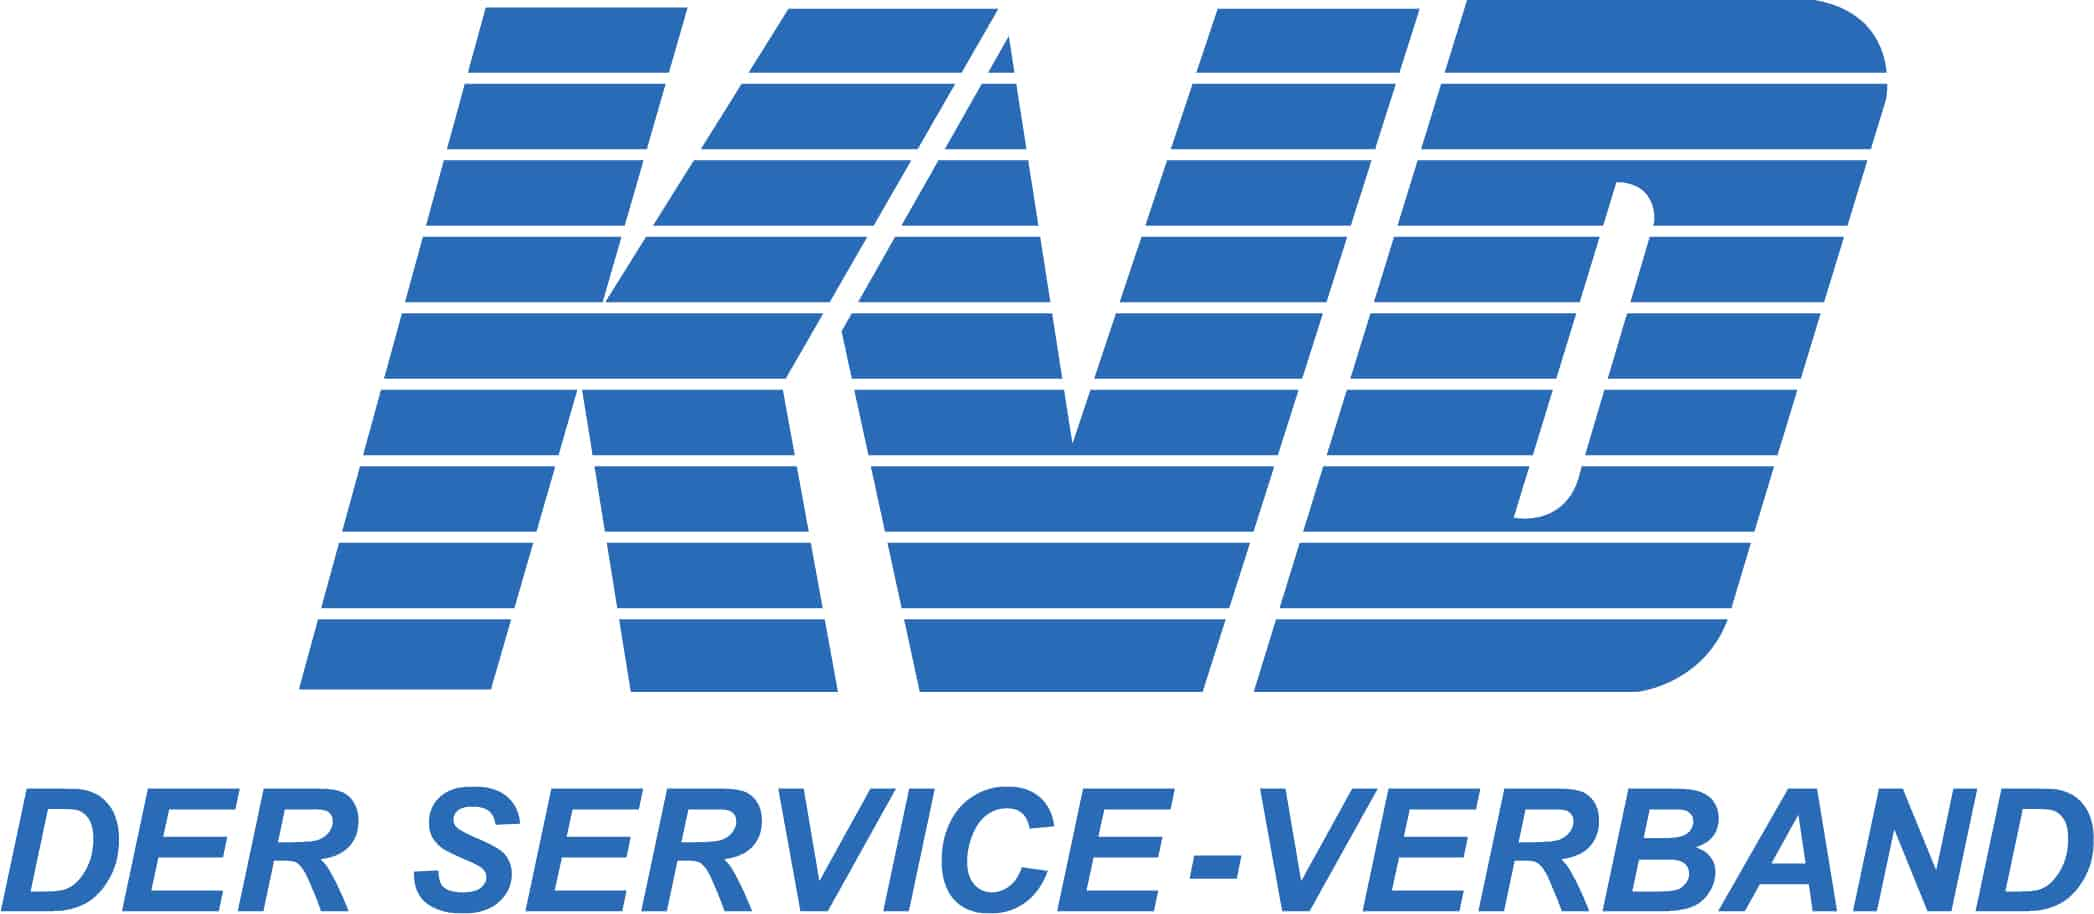 KVD Service Verband Mitglied Christian Florschütz Consulting Interim Management After Sales Service und Business Development